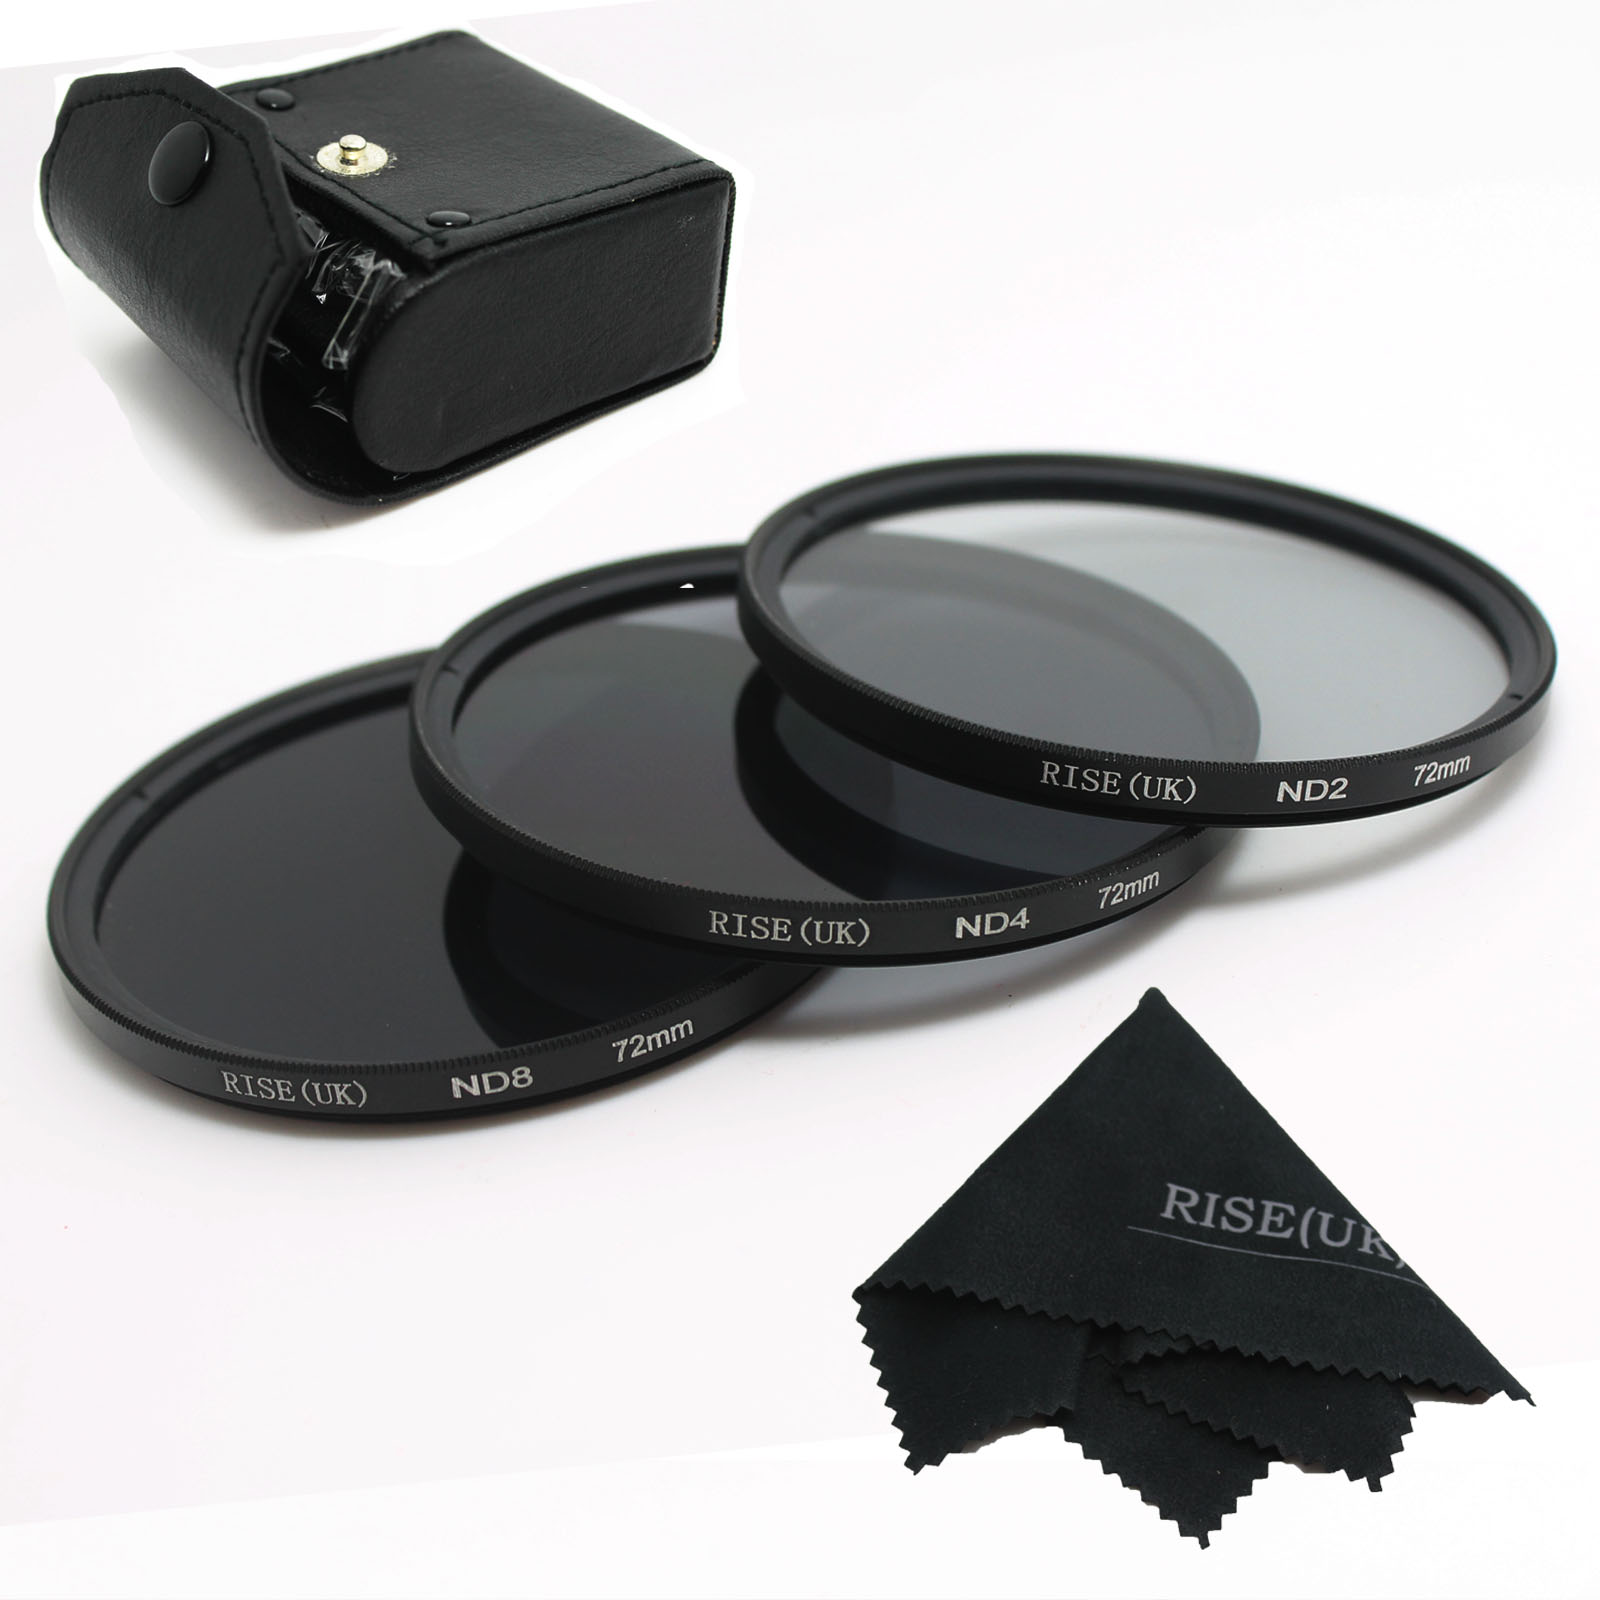 Alto quanlity! 100% guarantee RISE (UK) nuevo profesional 72mm ND2 nd4 ND8 Kit de filtro macro para Canon Nikon Sony Pentax envío gratis